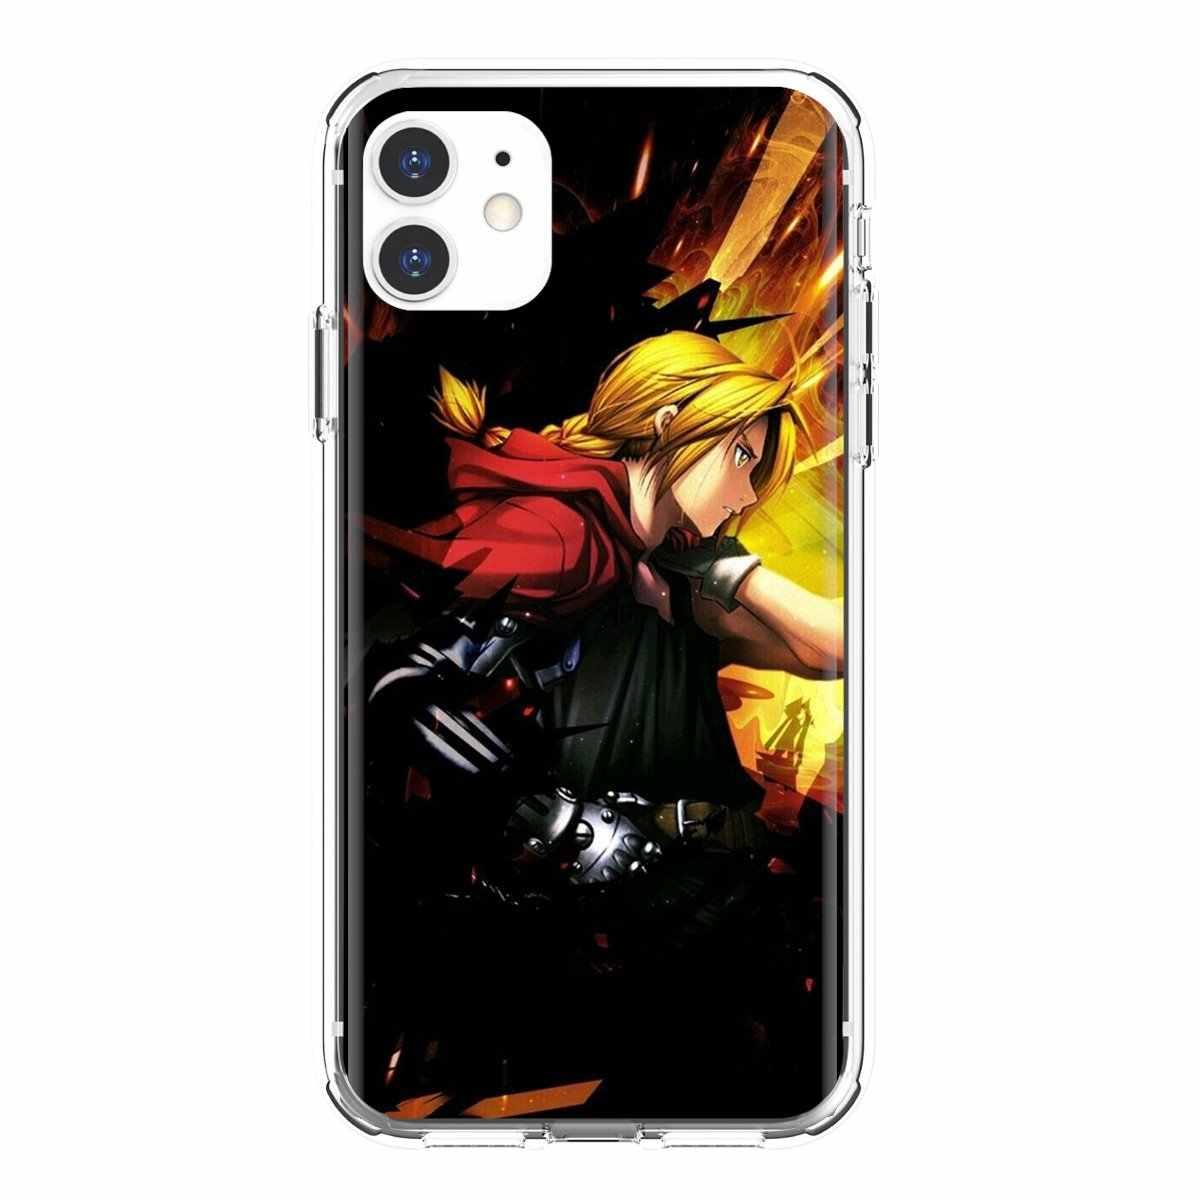 Ốp Lưng Dẻo Dành Cho Samsung Galaxy Samsung Galaxy J1 J2 J3 J4 J5 J6 J7 J8 Plus 2018 Prime 2015 2016 Anime Năm 2017 fullmetal Alchemist Edward Elric